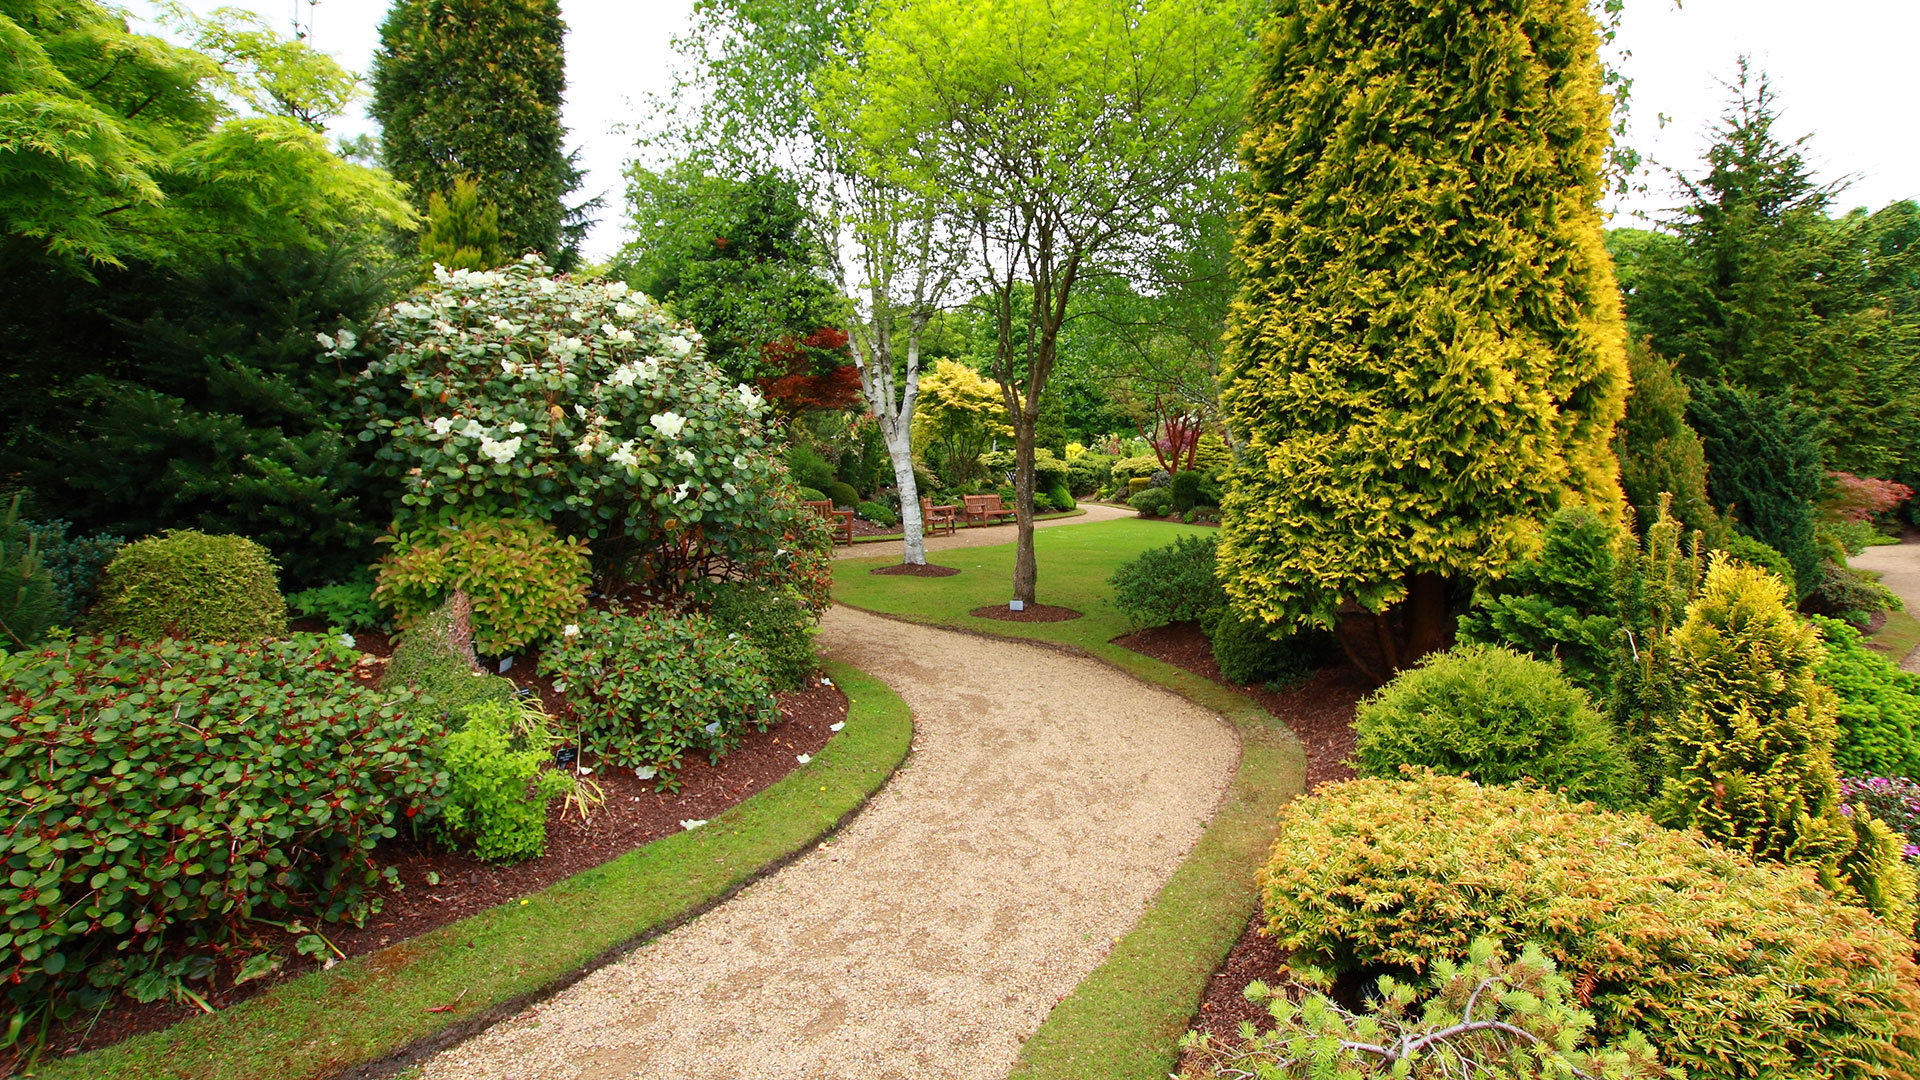 Mckinney Landscaping: Irrigation, Landscaping and Landscape ...